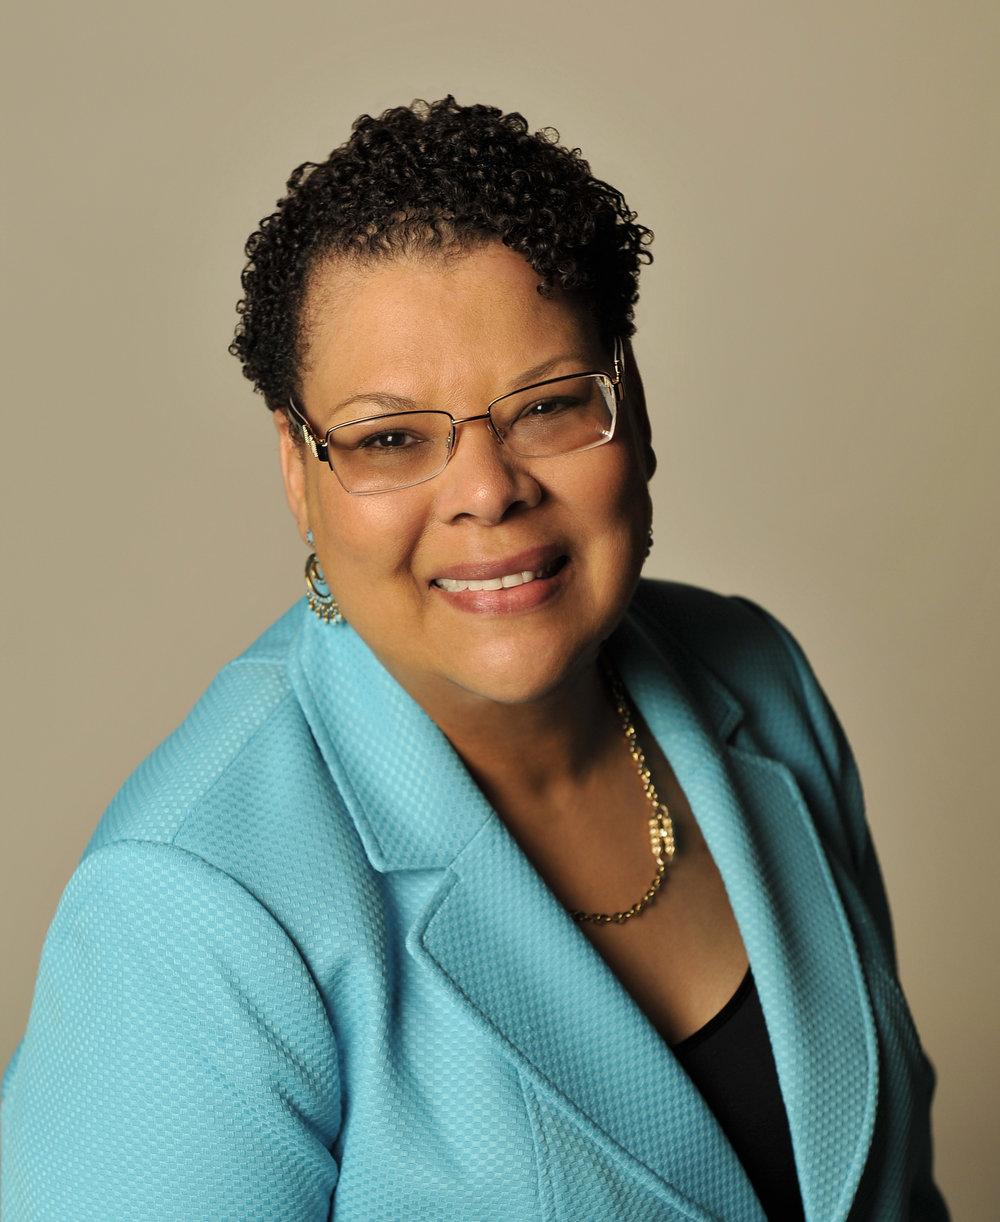 Reverend Vivian Nixon